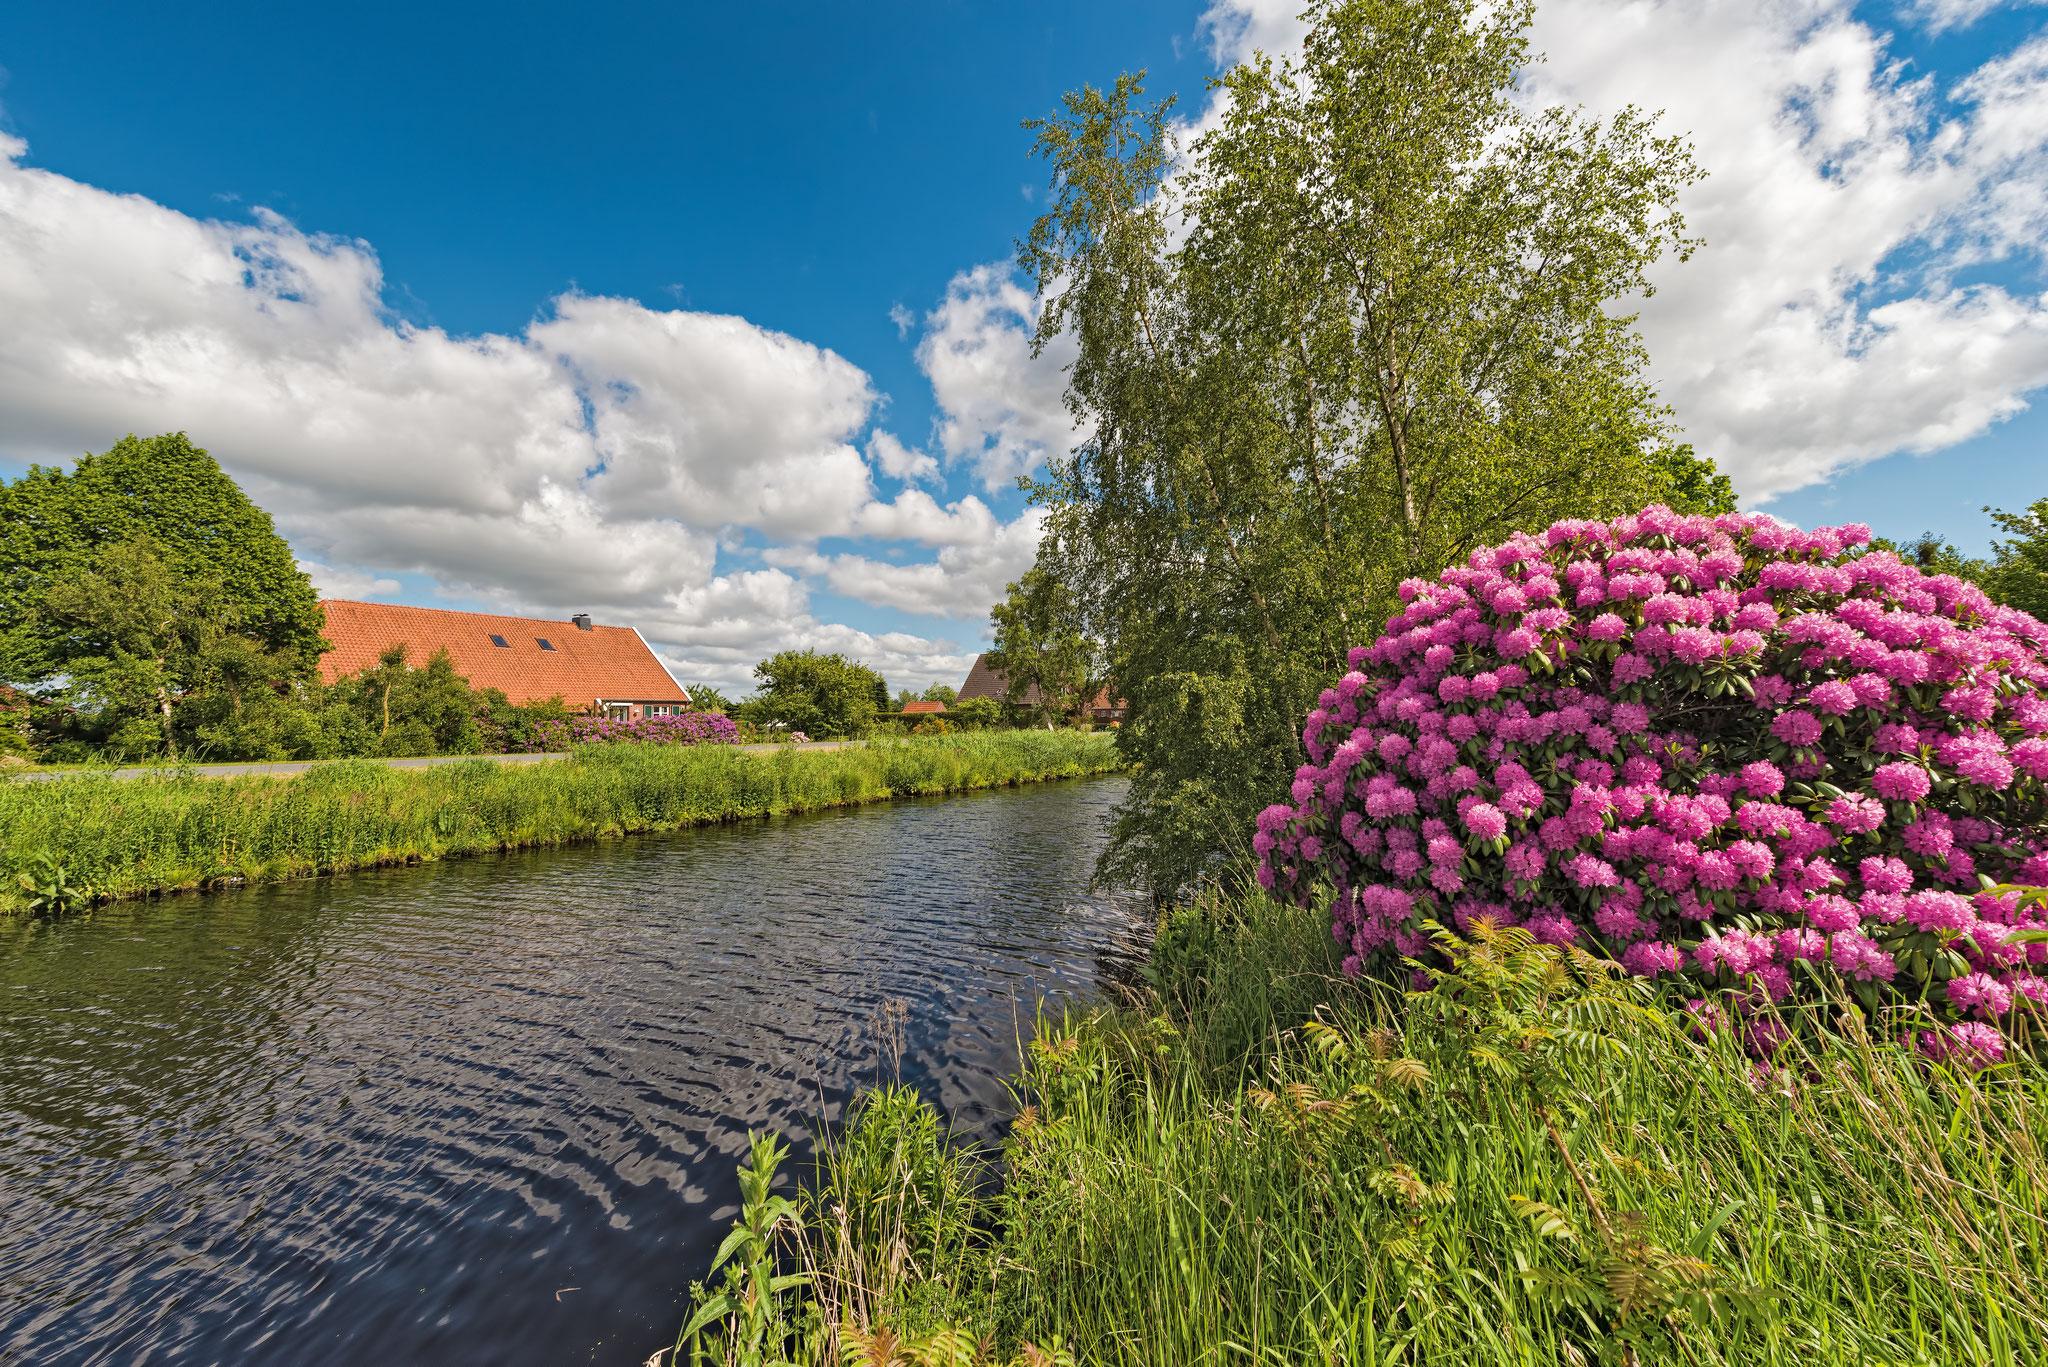 Ems-Jade-Kanal Wiesmoor Ostfriesland